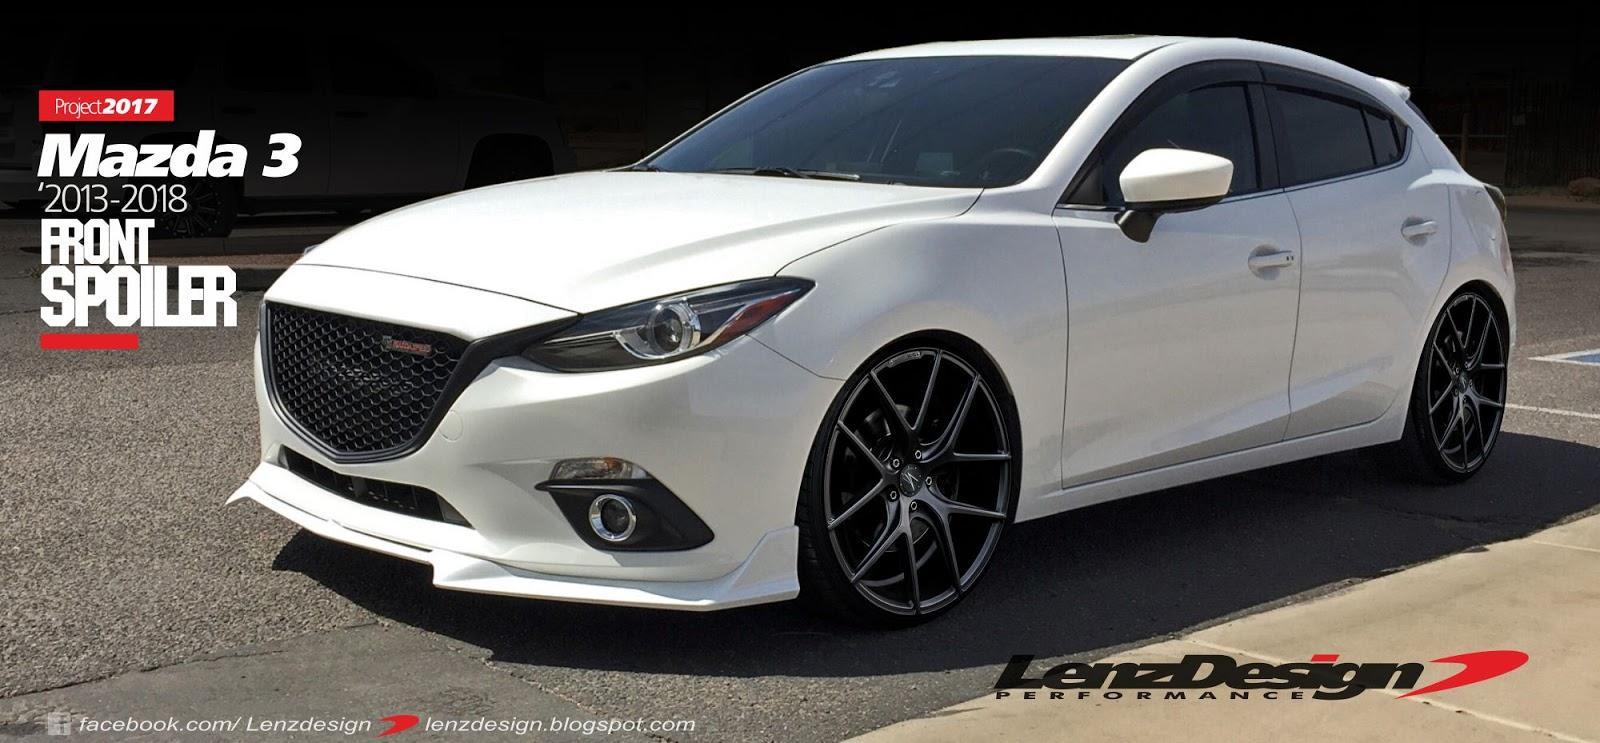 Mazda 3 Axela 2017 >> Mazda 3 BM Axela Tuning & Body Kit Lenzdesign Performance 2013 2014 2015 2016 2017 2018